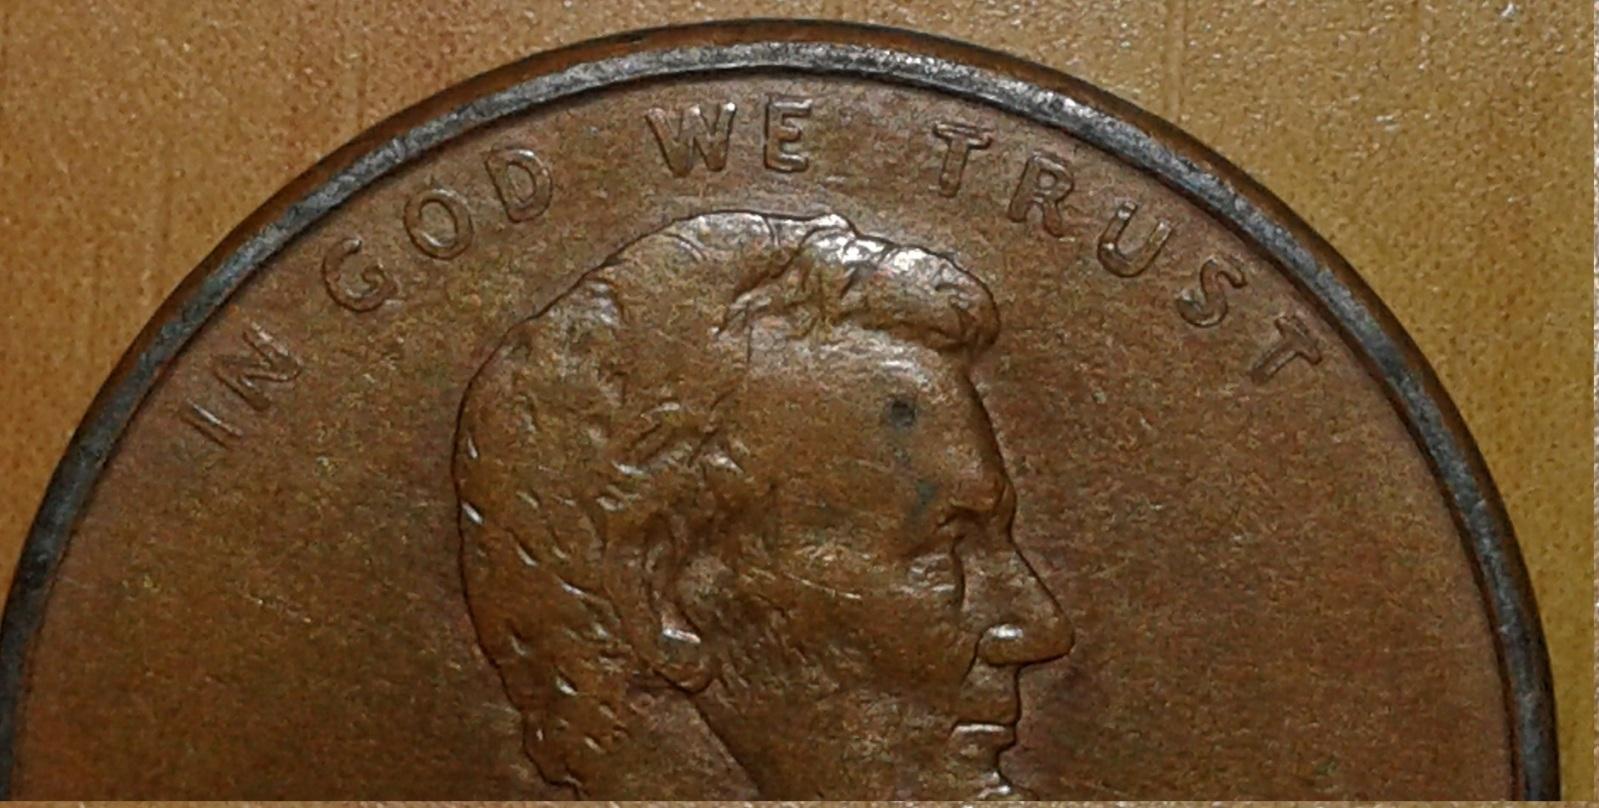 Moneda de un centavo U.S.A. 1996 14bnuhj